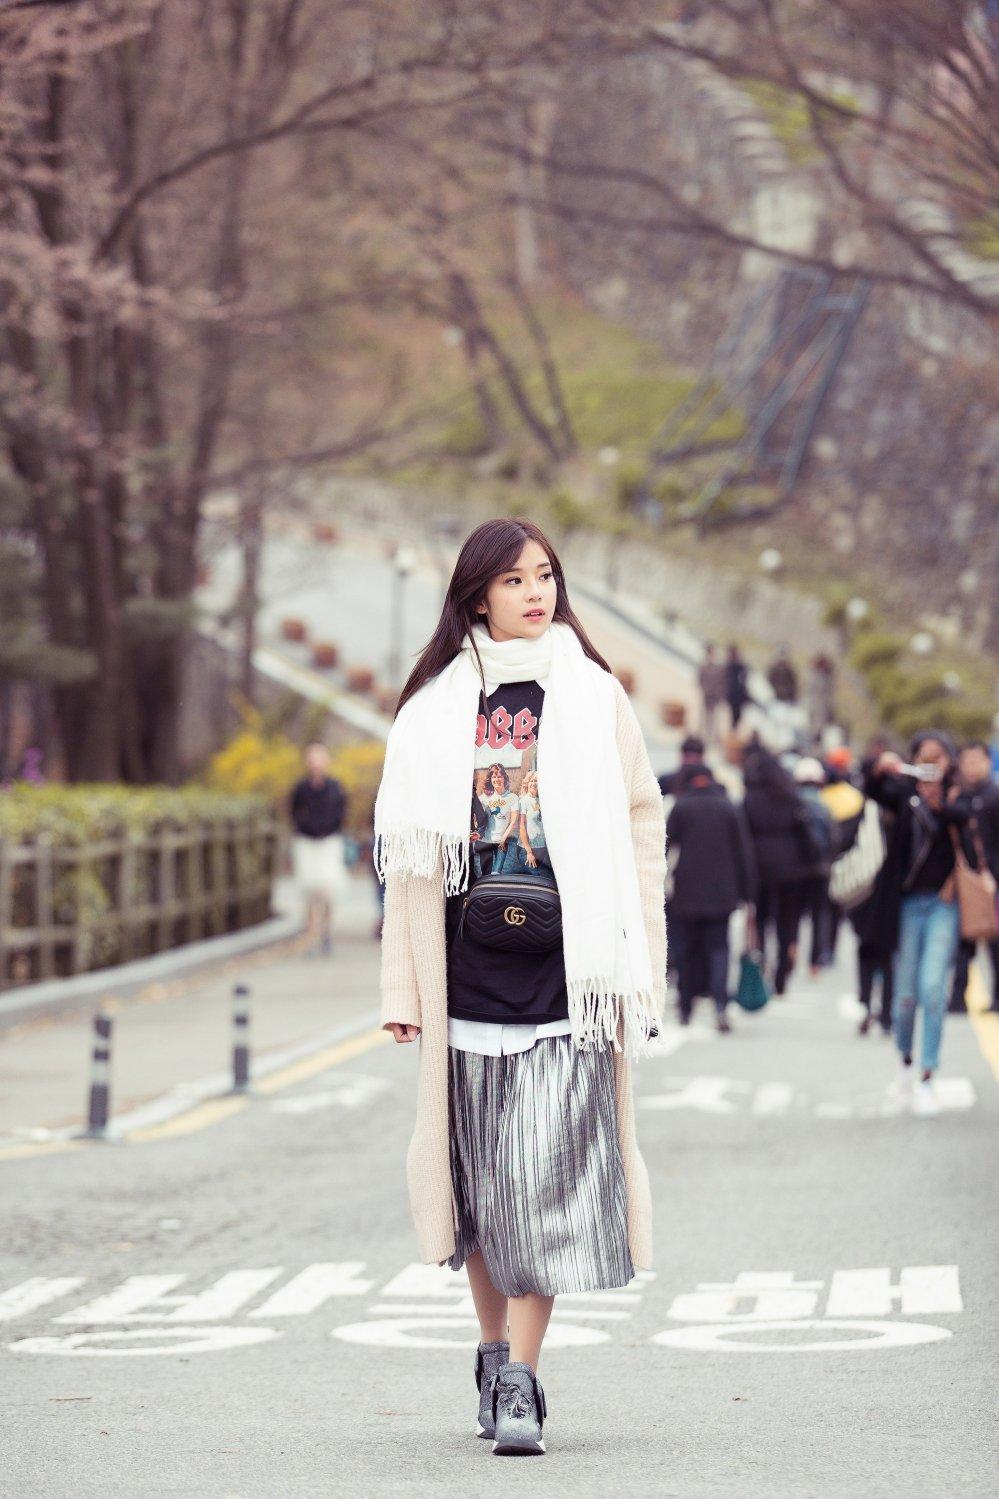 Hoang Yen Chibi tu lam stylist, khoe nhan sac trong veo tai Han Quoc hinh anh 10